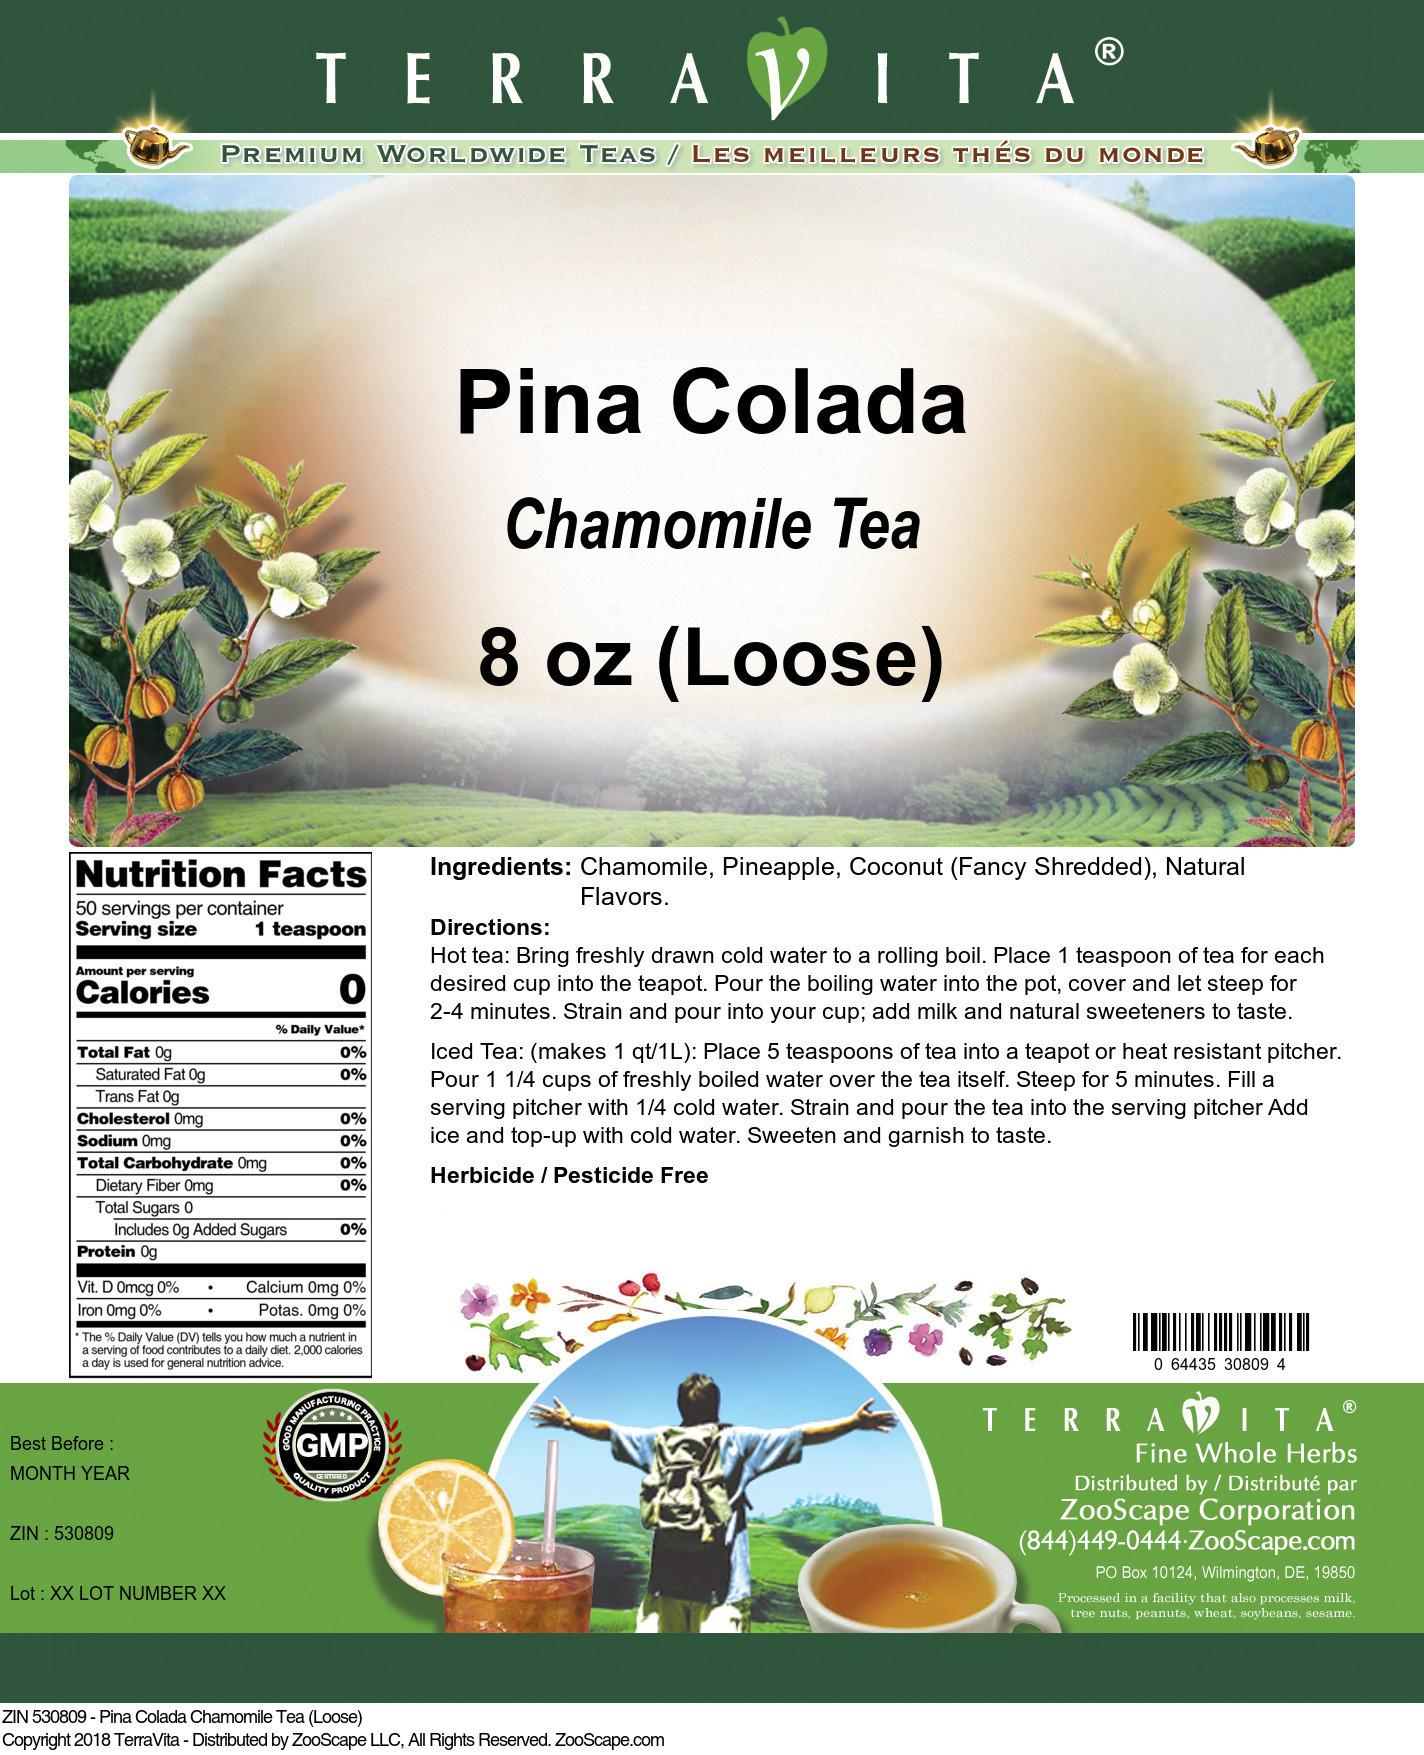 Pina Colada Chamomile Tea